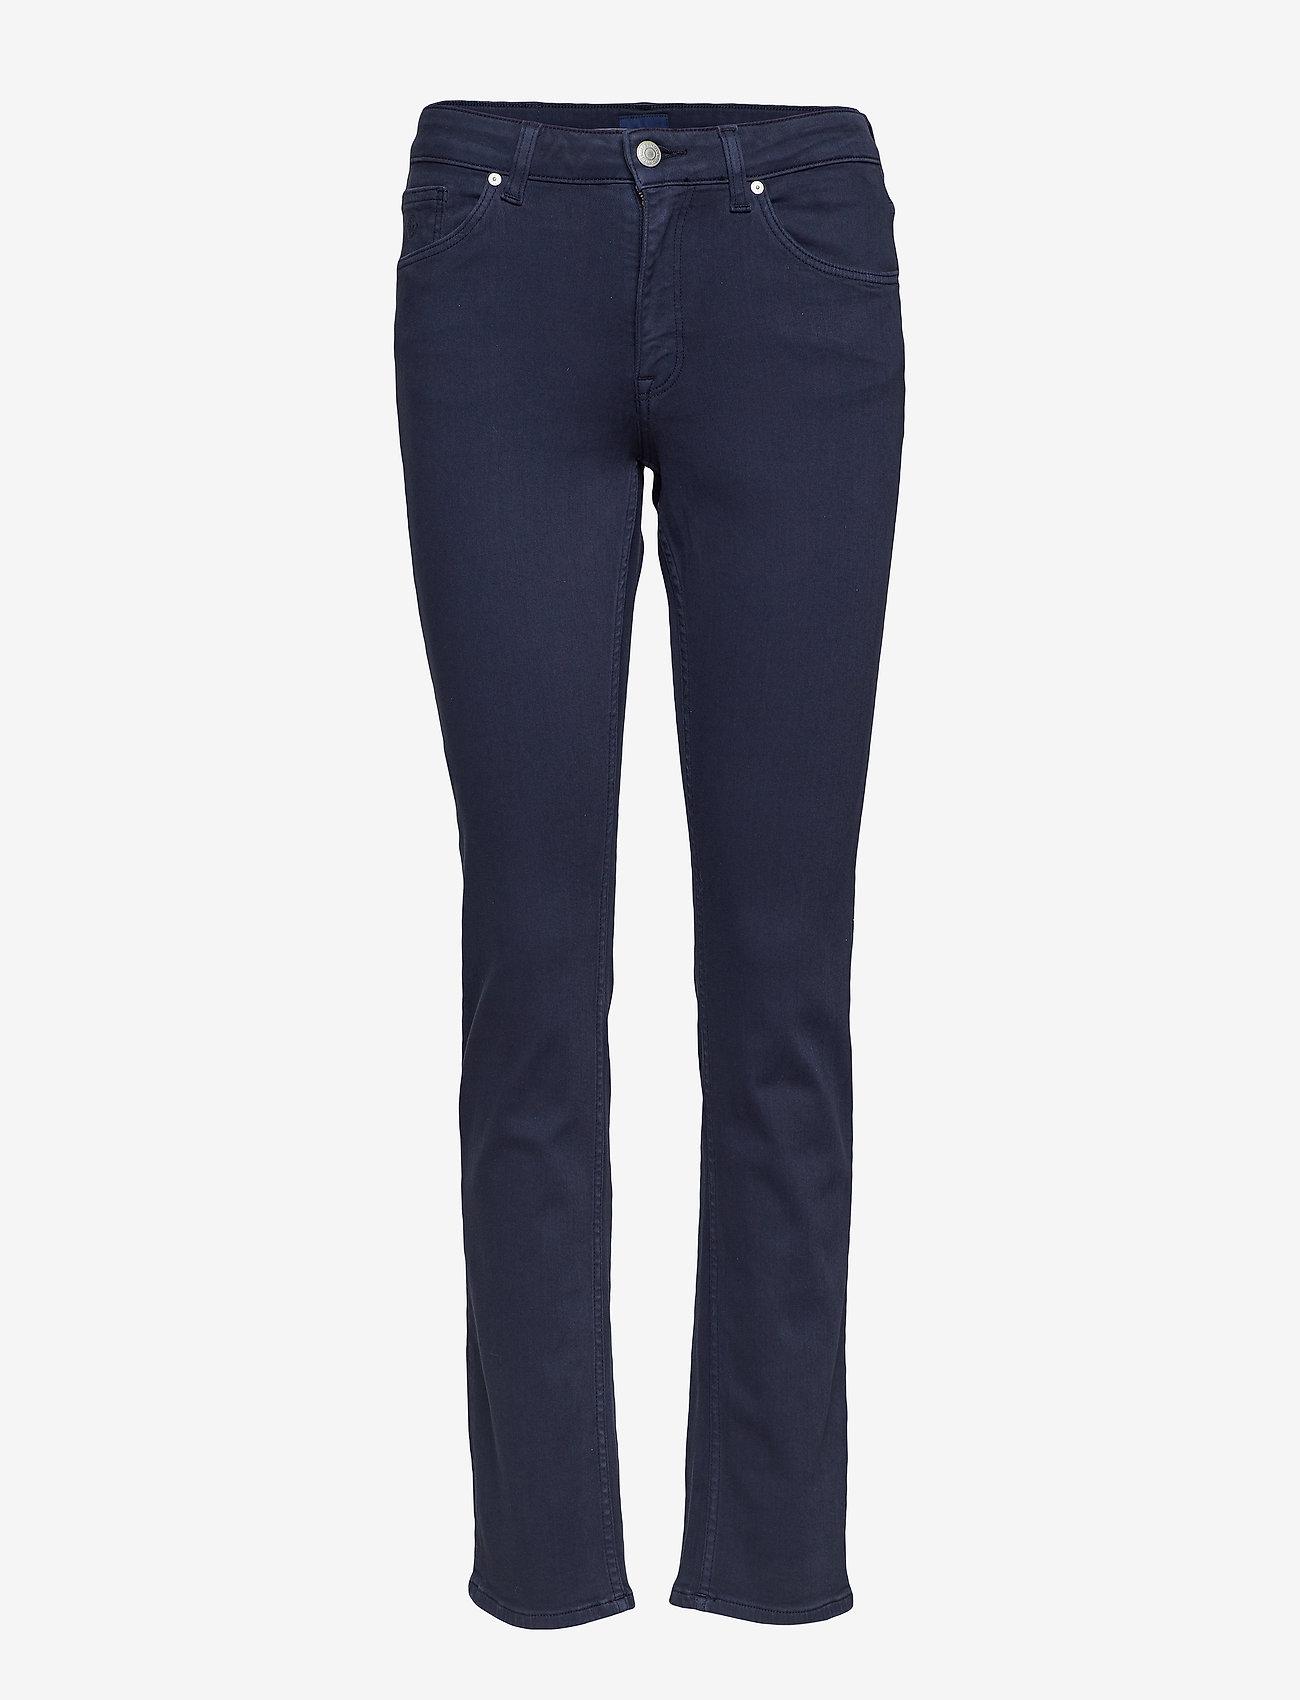 GANT - SLIM TWILL JEANS - slim jeans - marine - 0